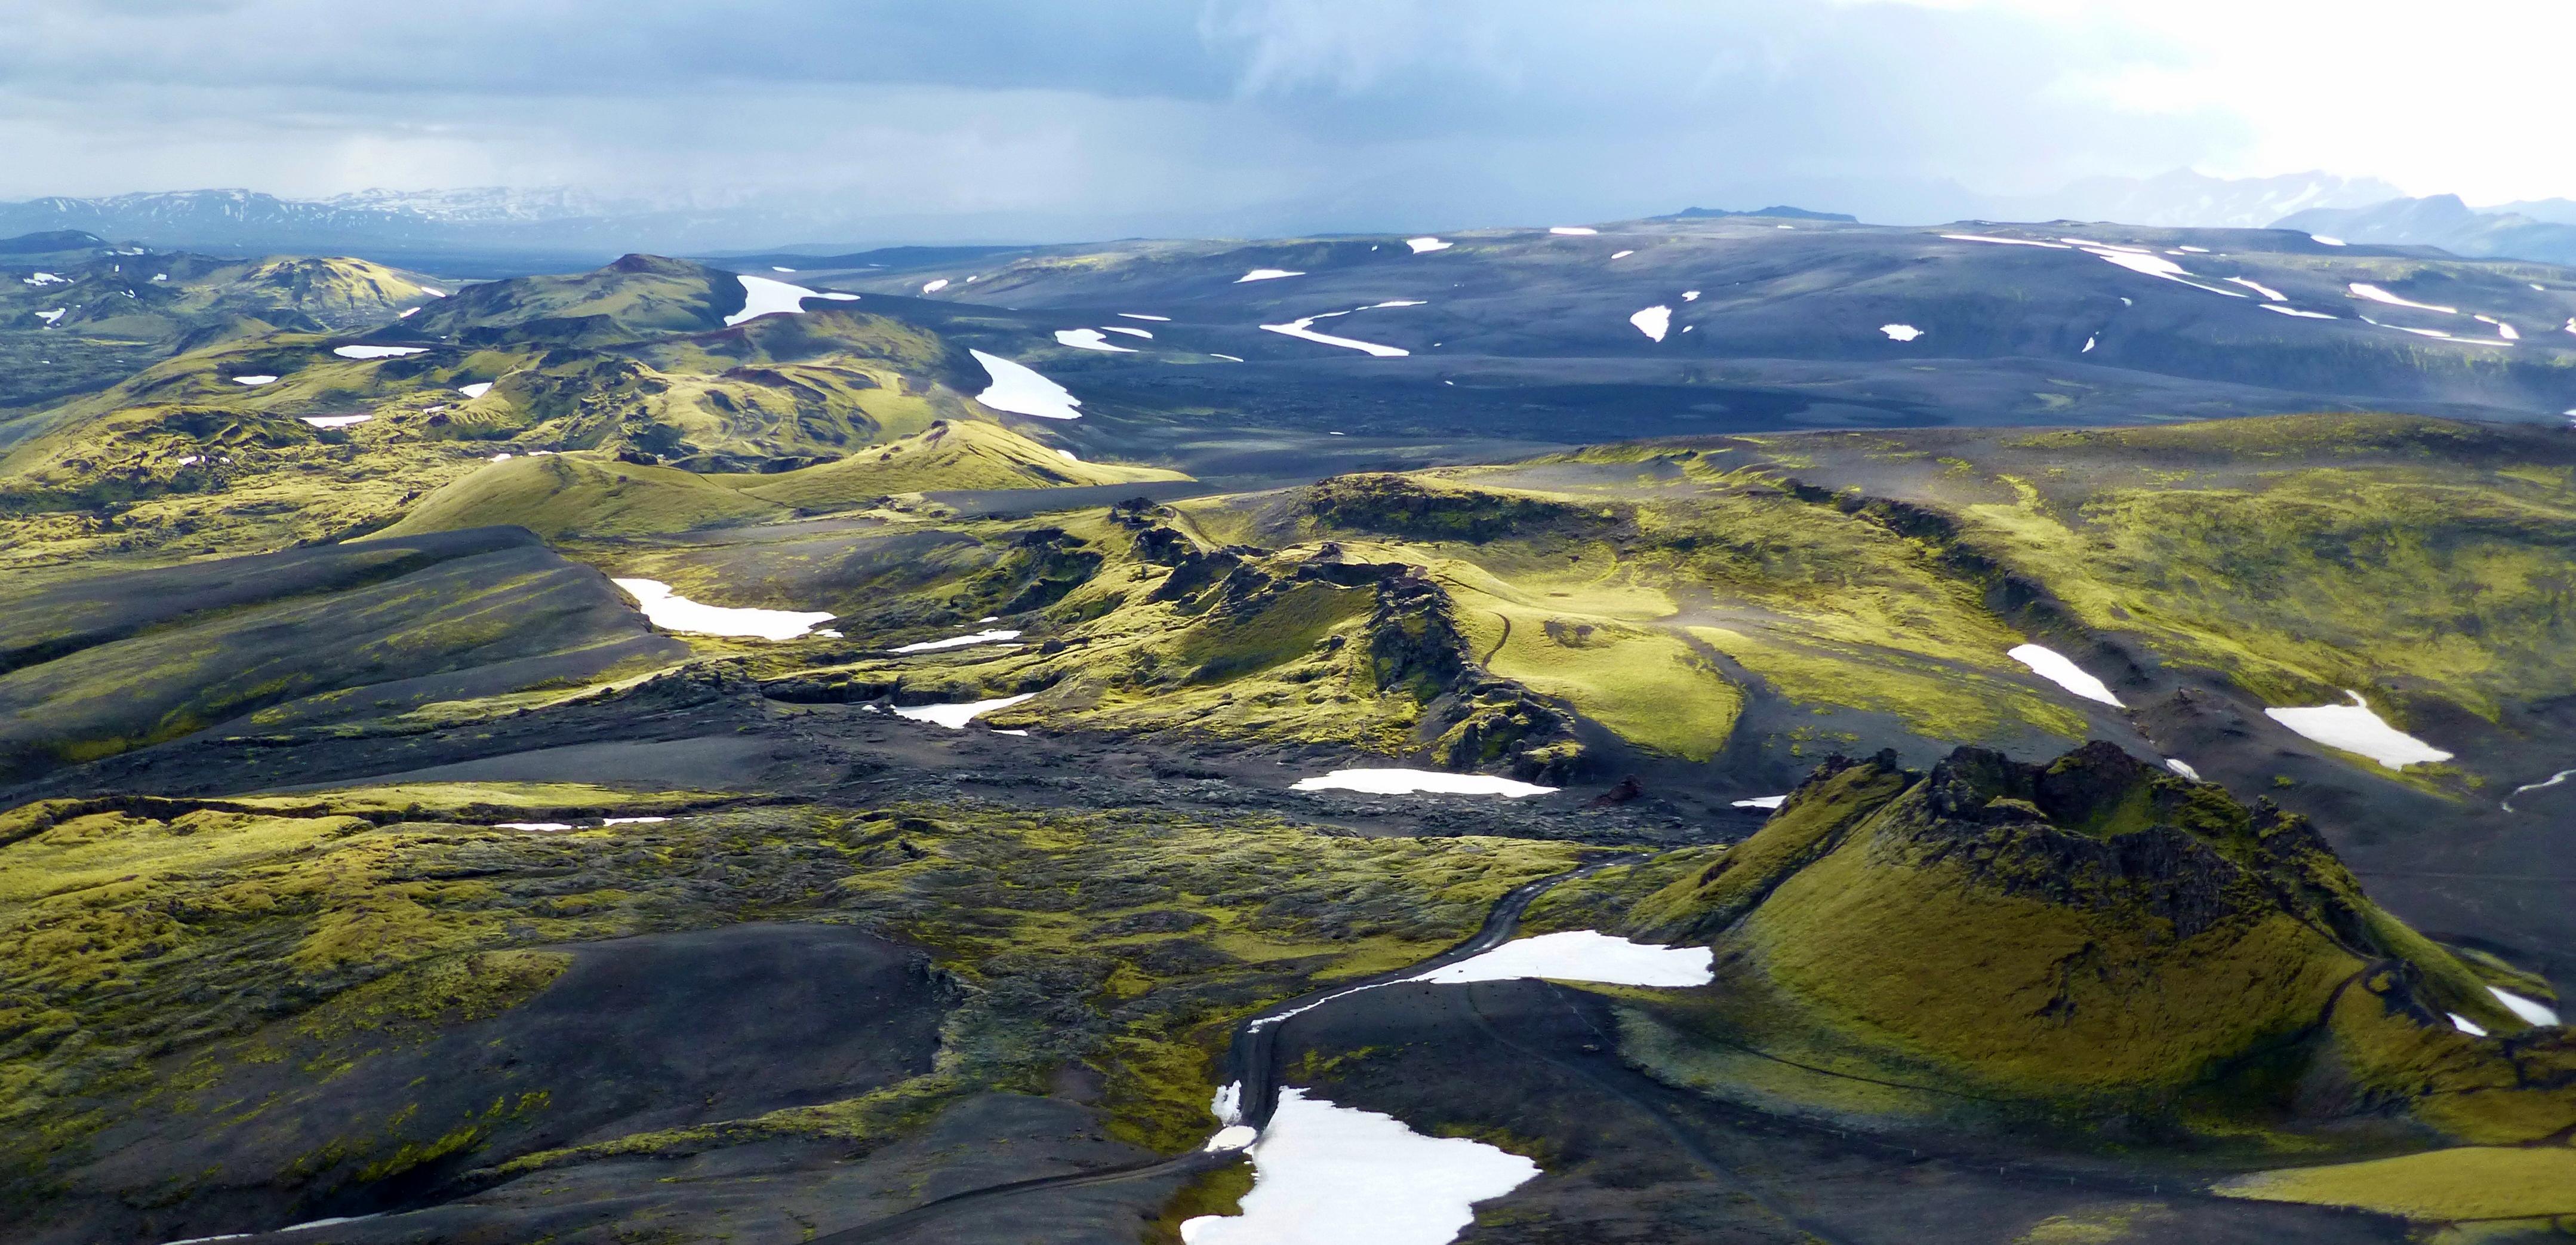 Island, Hochland, Laki, Vulkankrater, Natur, Landschaft, 2015